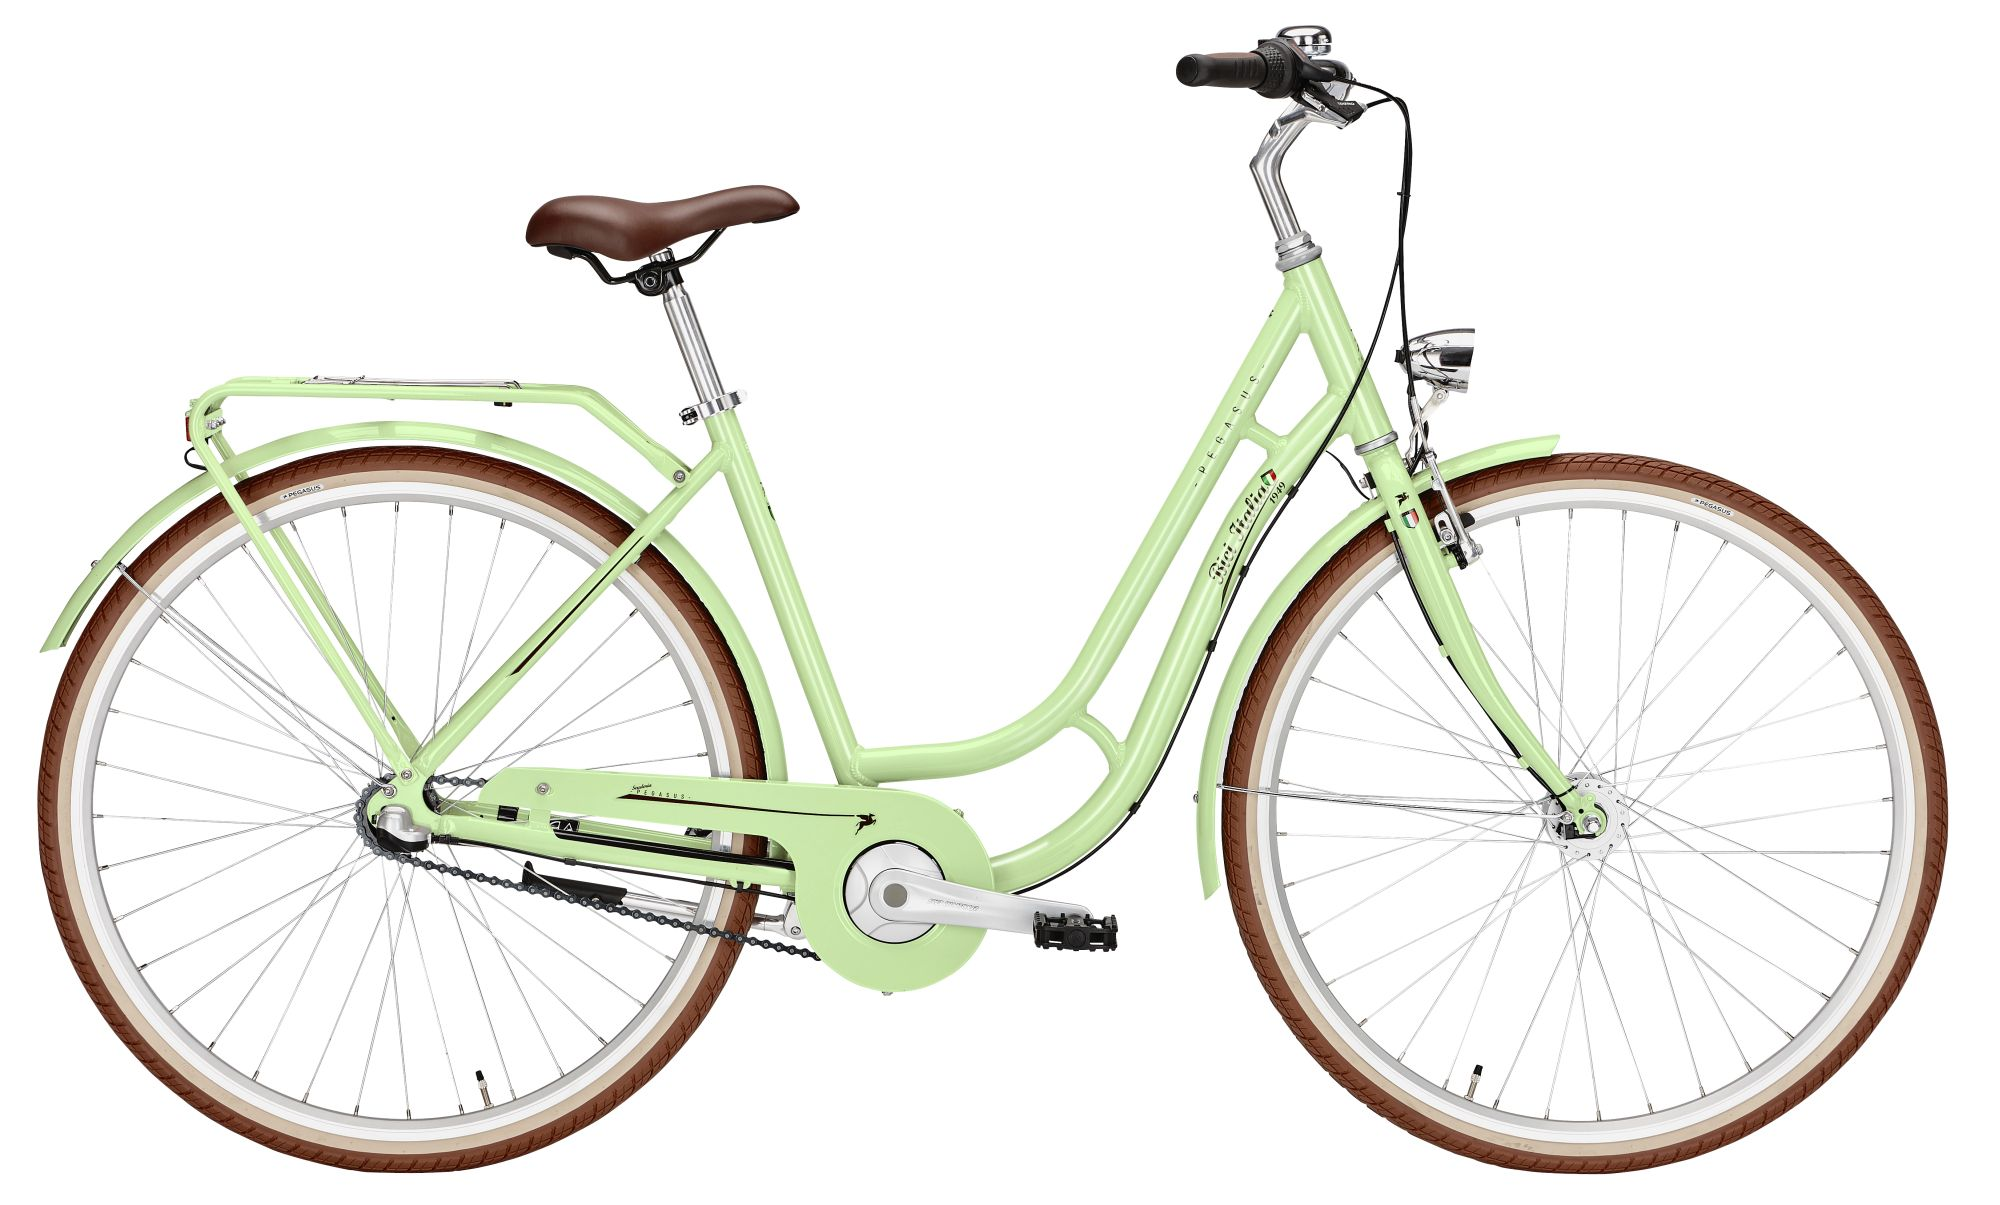 city-/tourenräder/Citybikes: Pegasus  Bici Italia 3s Tour 3 Gang Nabenschaltung Damenfahrrad Tiefeinsteiger Modell 2021 28 Zoll 50 cm